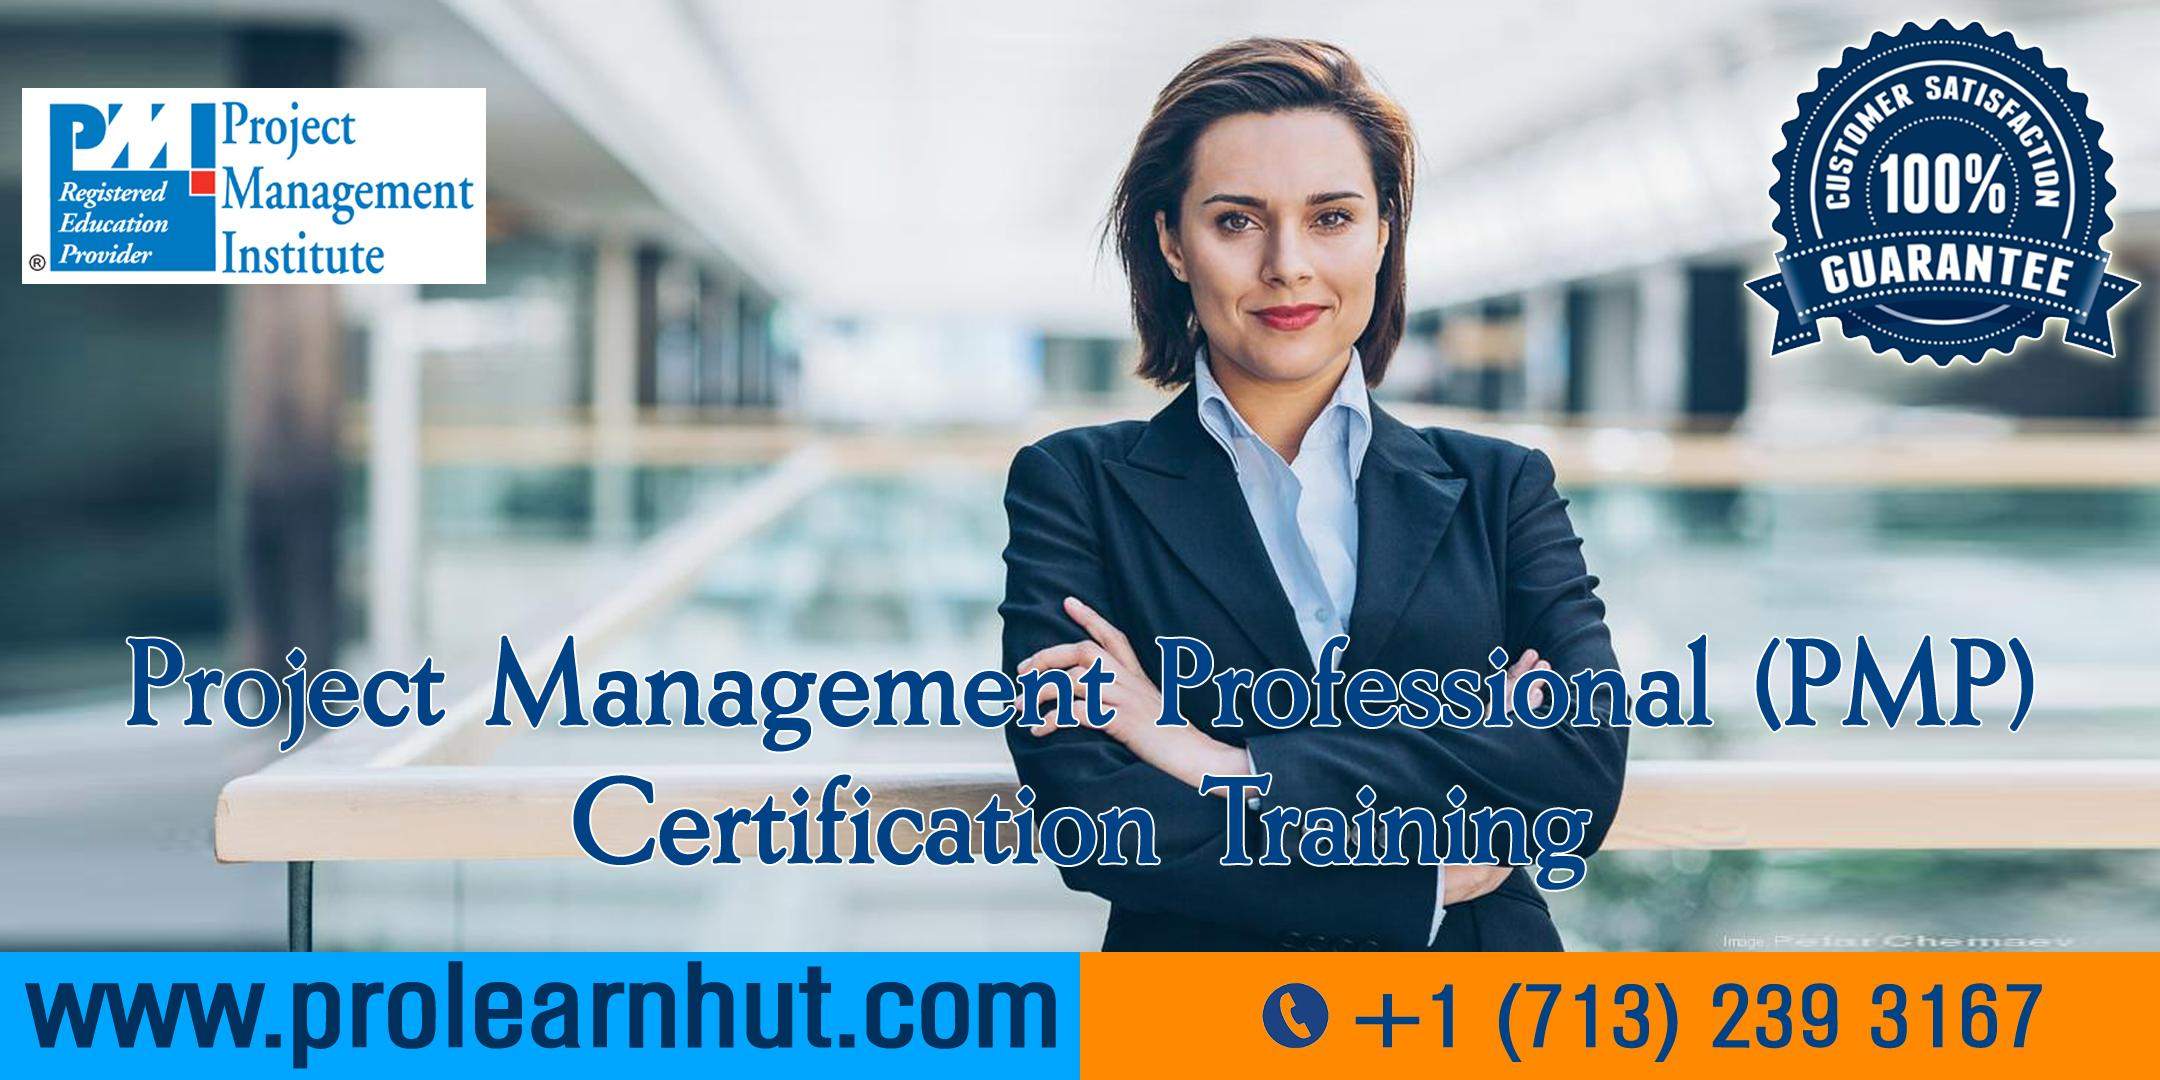 PMP Certification | Project Management Certification| PMP Training in Tempe, AZ | ProLearnHut